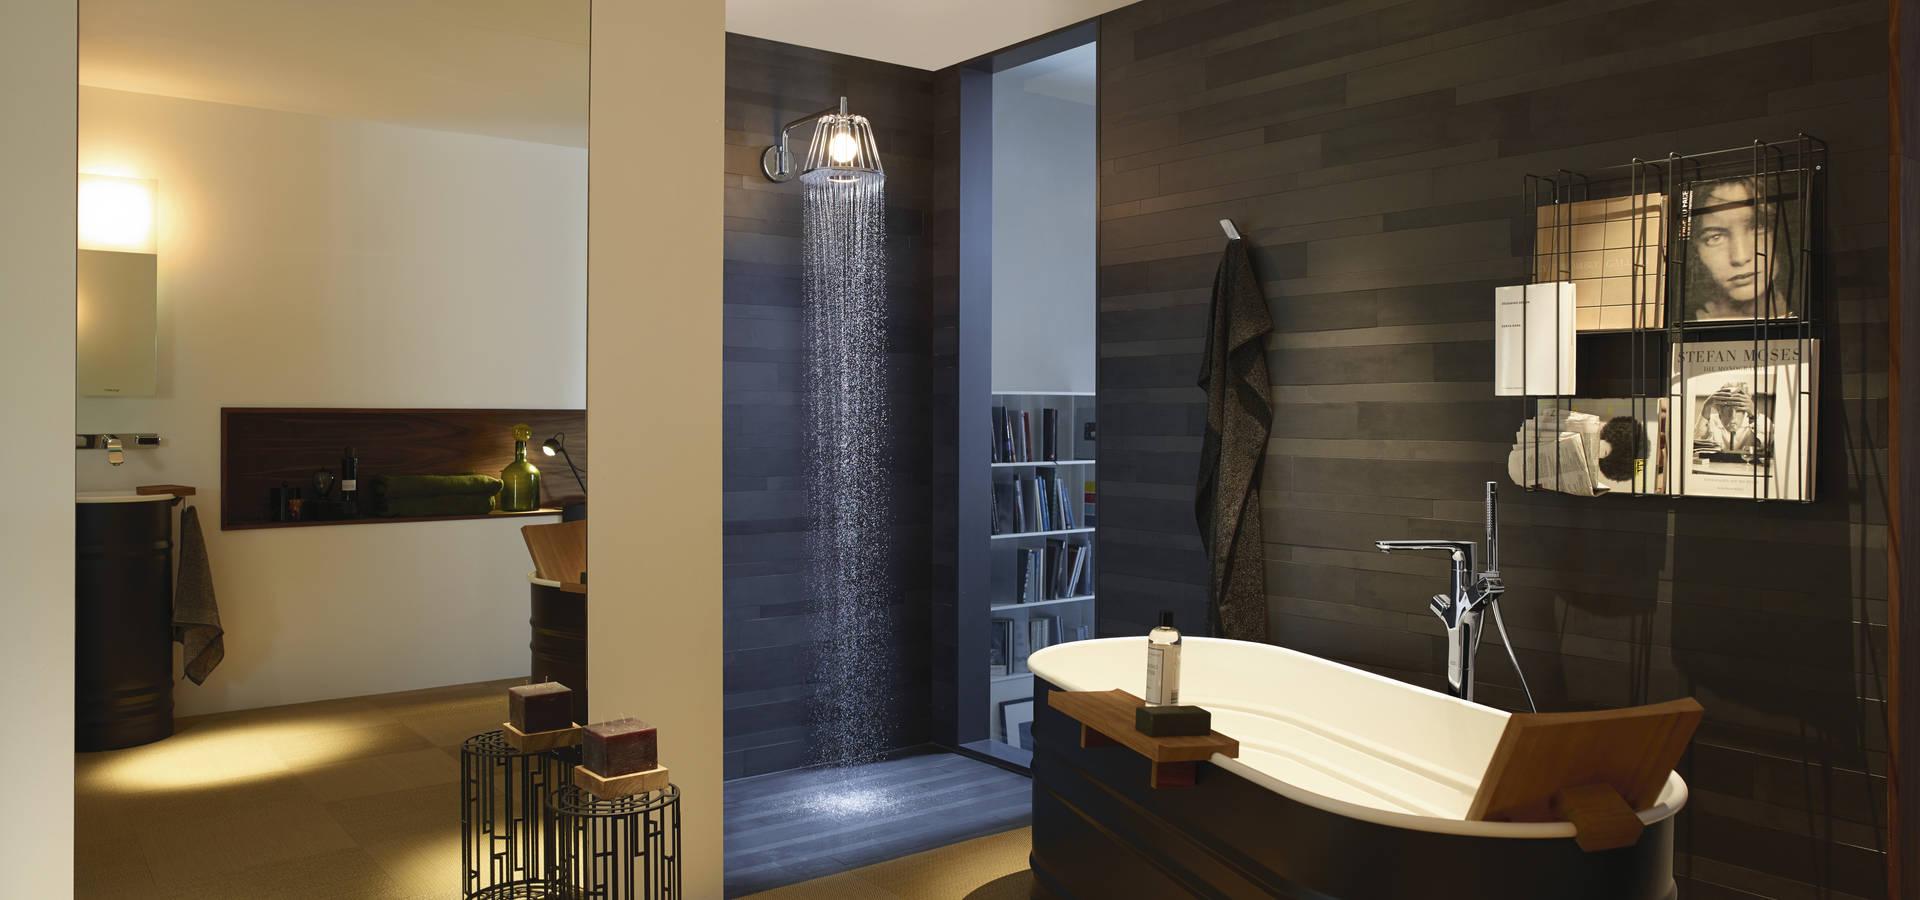 Espace aubade salle de bains moderne par espace aubade for Devis salle de bain aubade